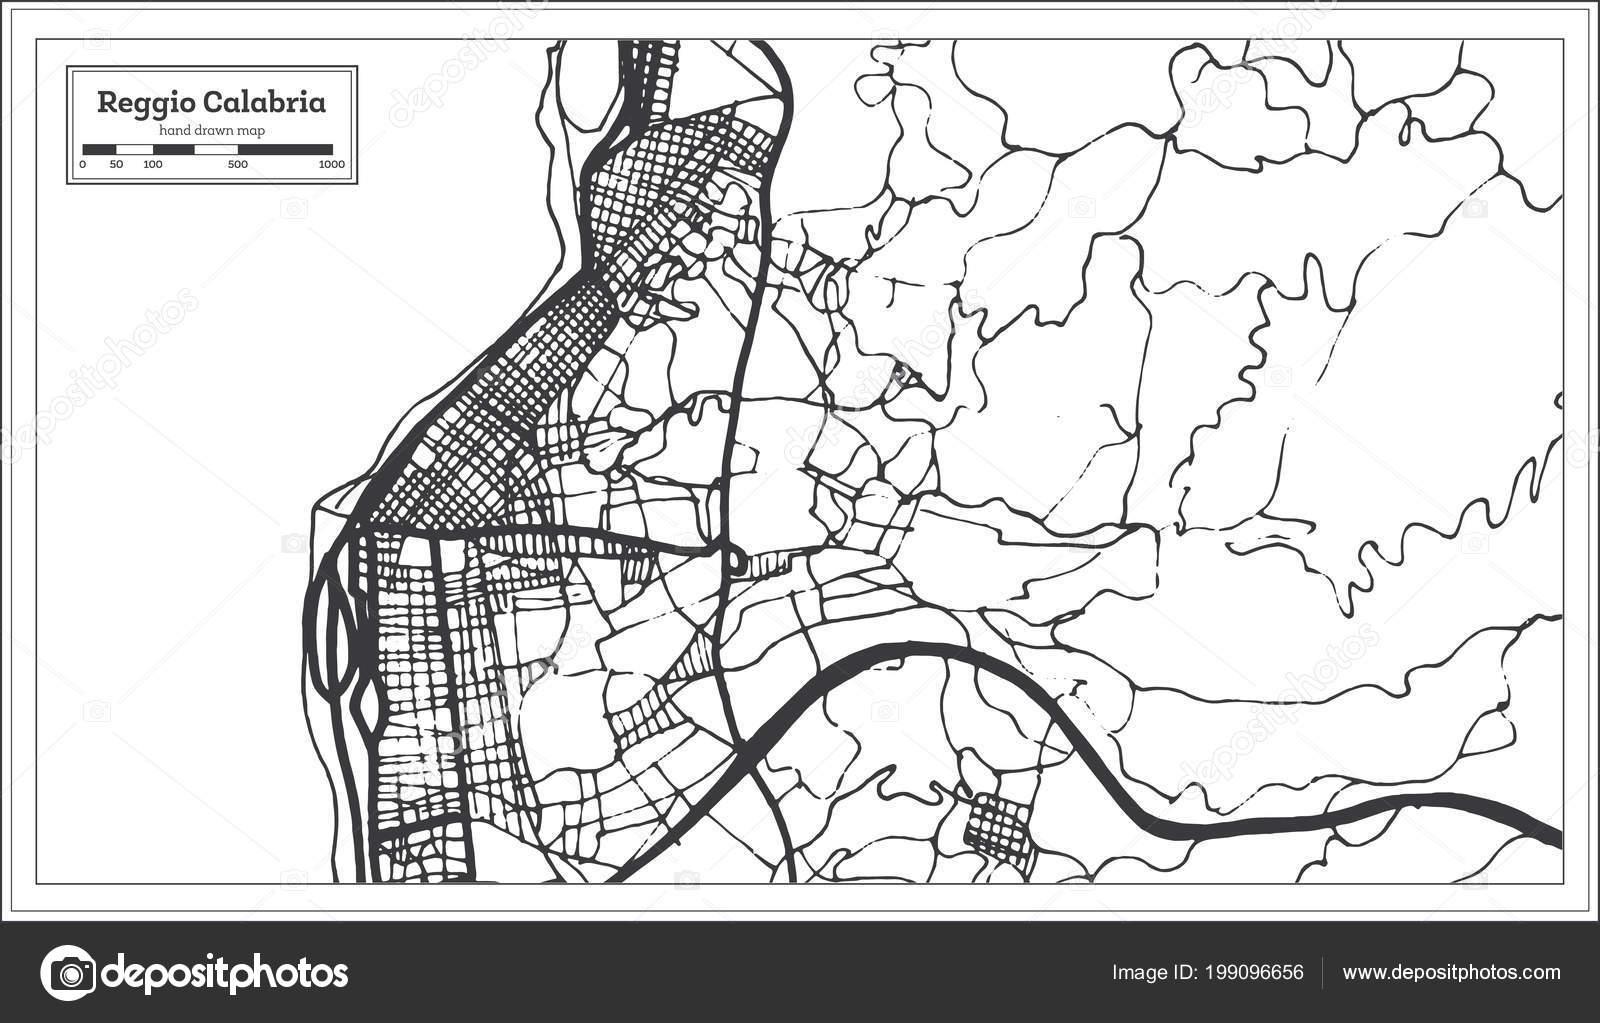 Cartina Calabria Muta.Immagini Cartina Muta Calabria Mappa Reggio Calabria